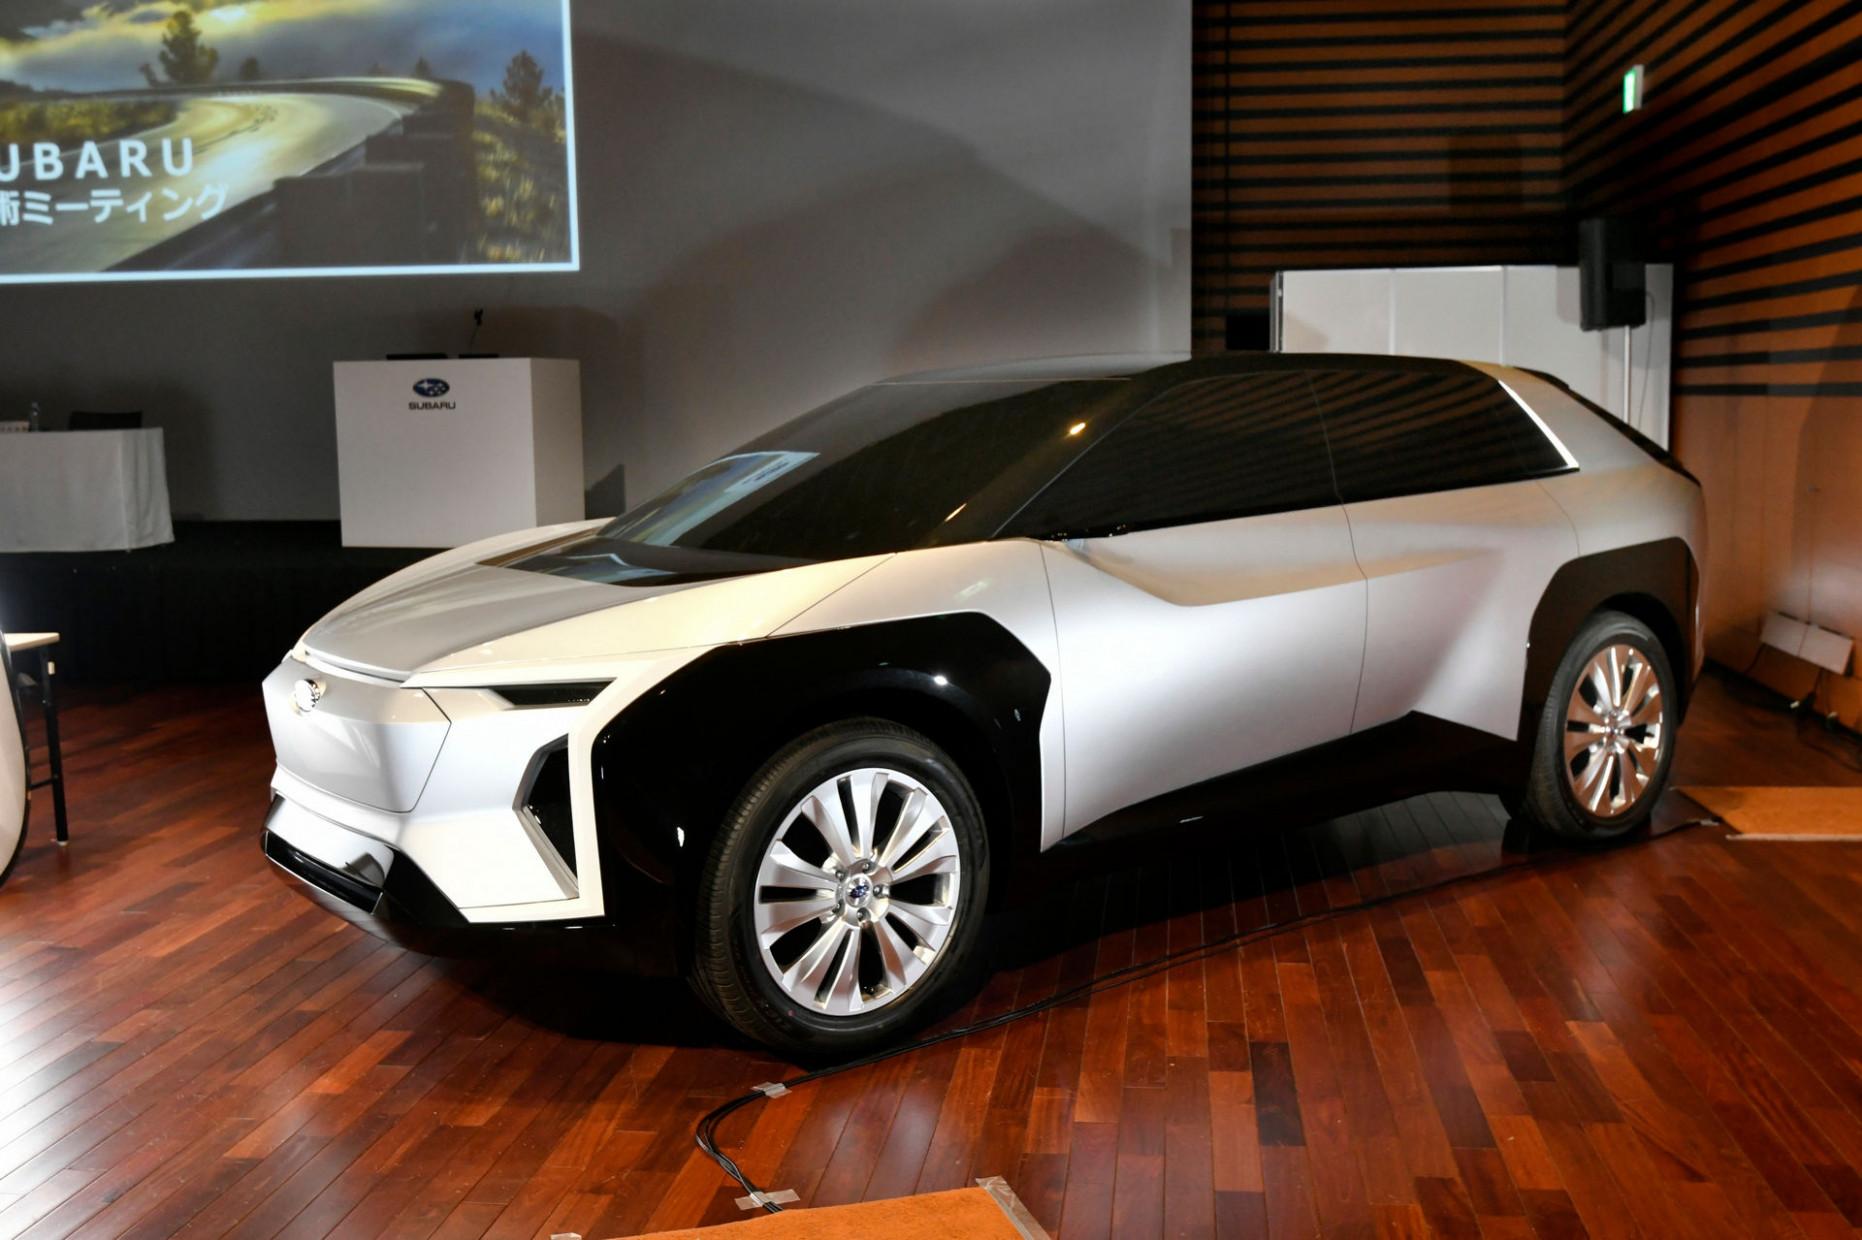 Review 2022 Subaru Crosstrek Hybridand